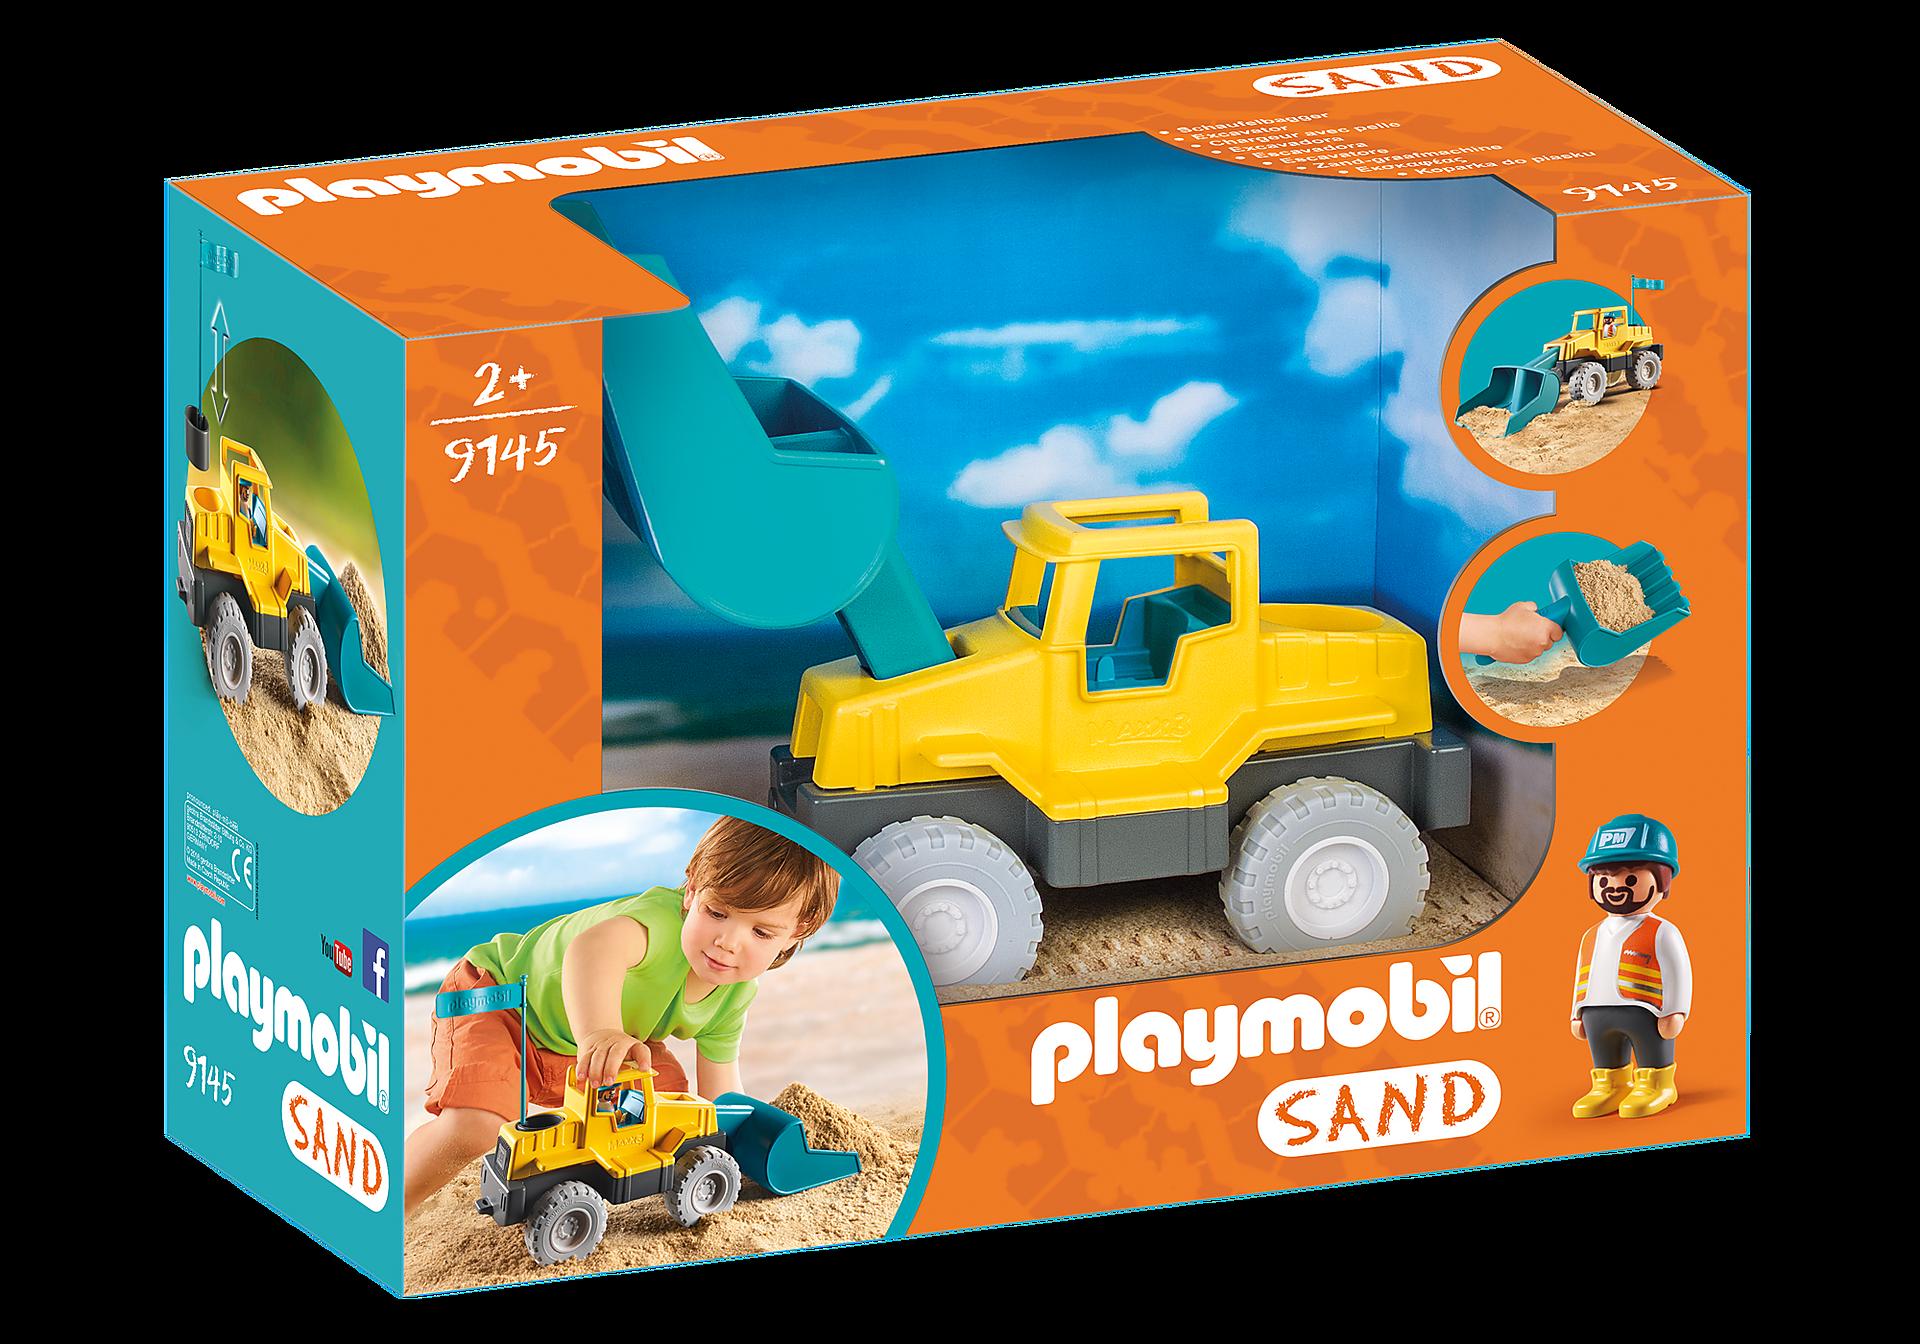 http://media.playmobil.com/i/playmobil/9145_product_box_front/Excavadora